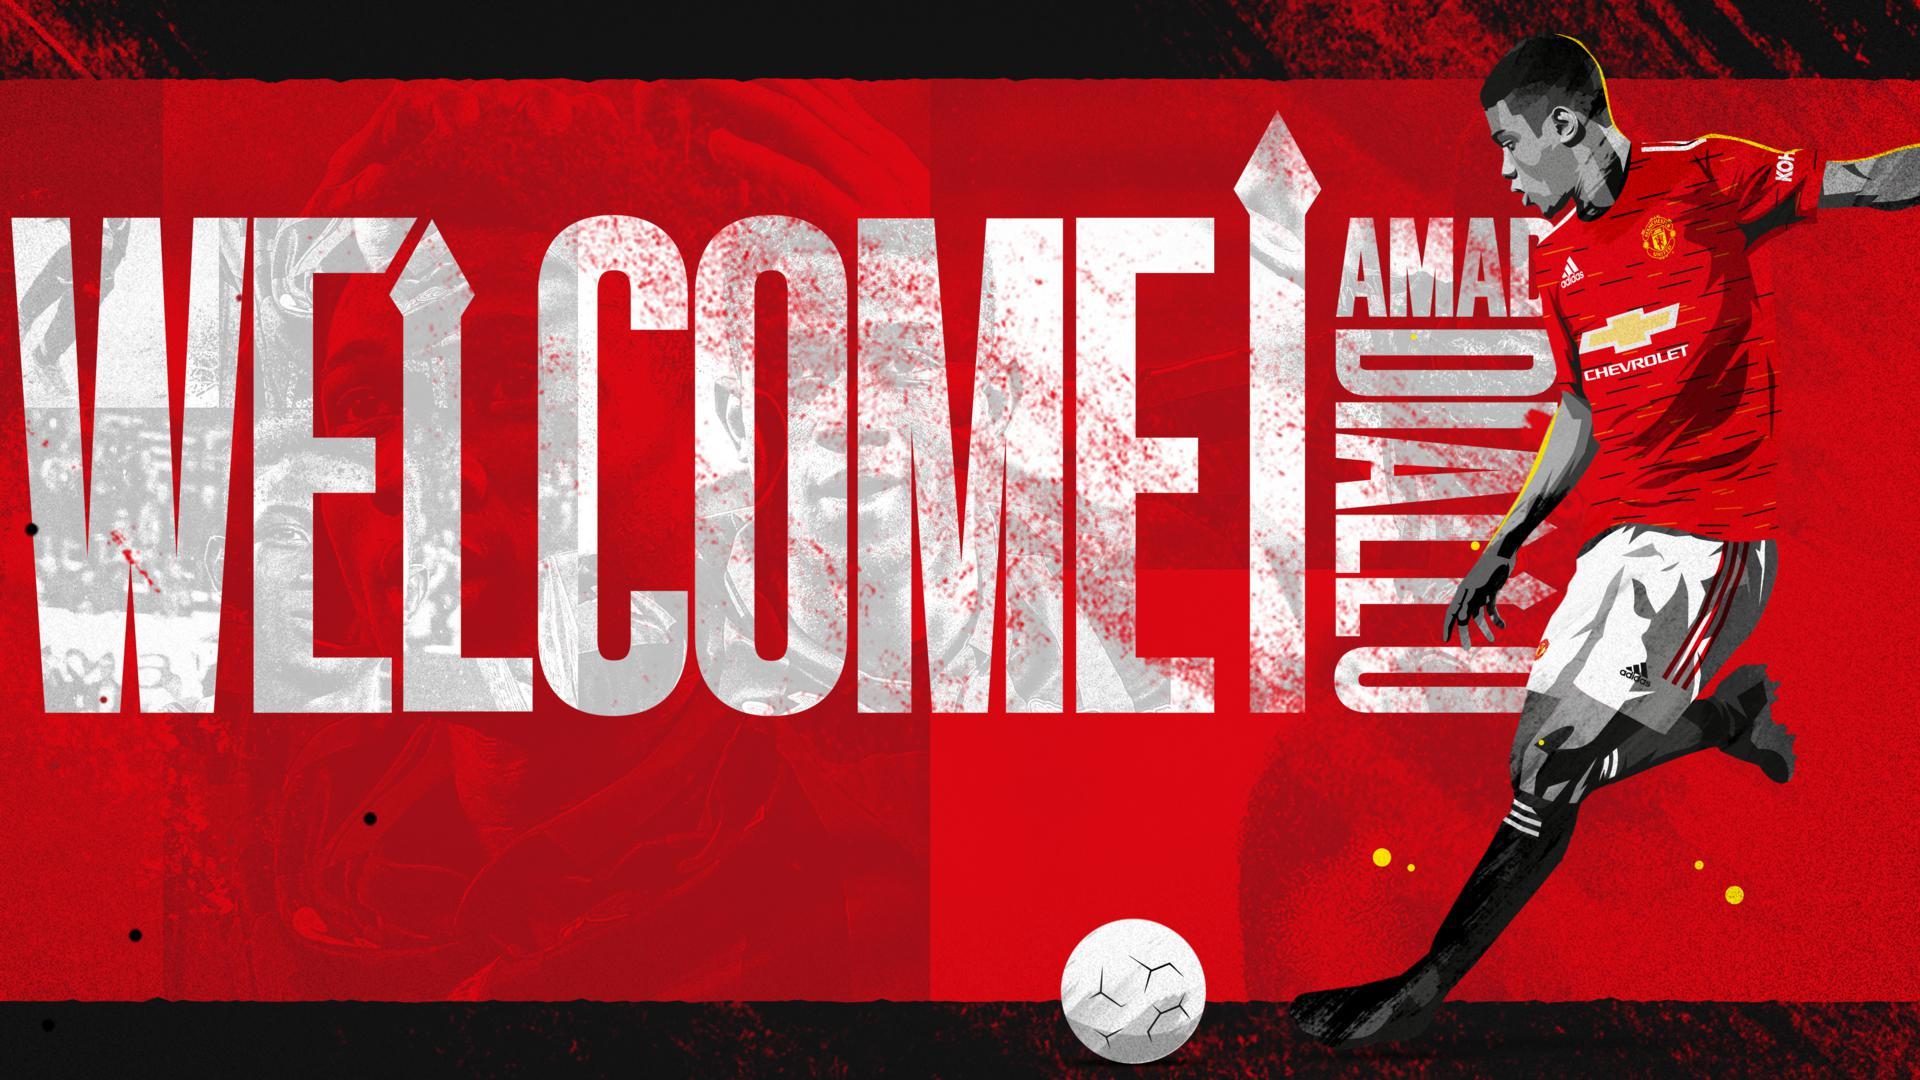 Confirmado: Diallo ya es jugador de United   Web oficial del Manchester United